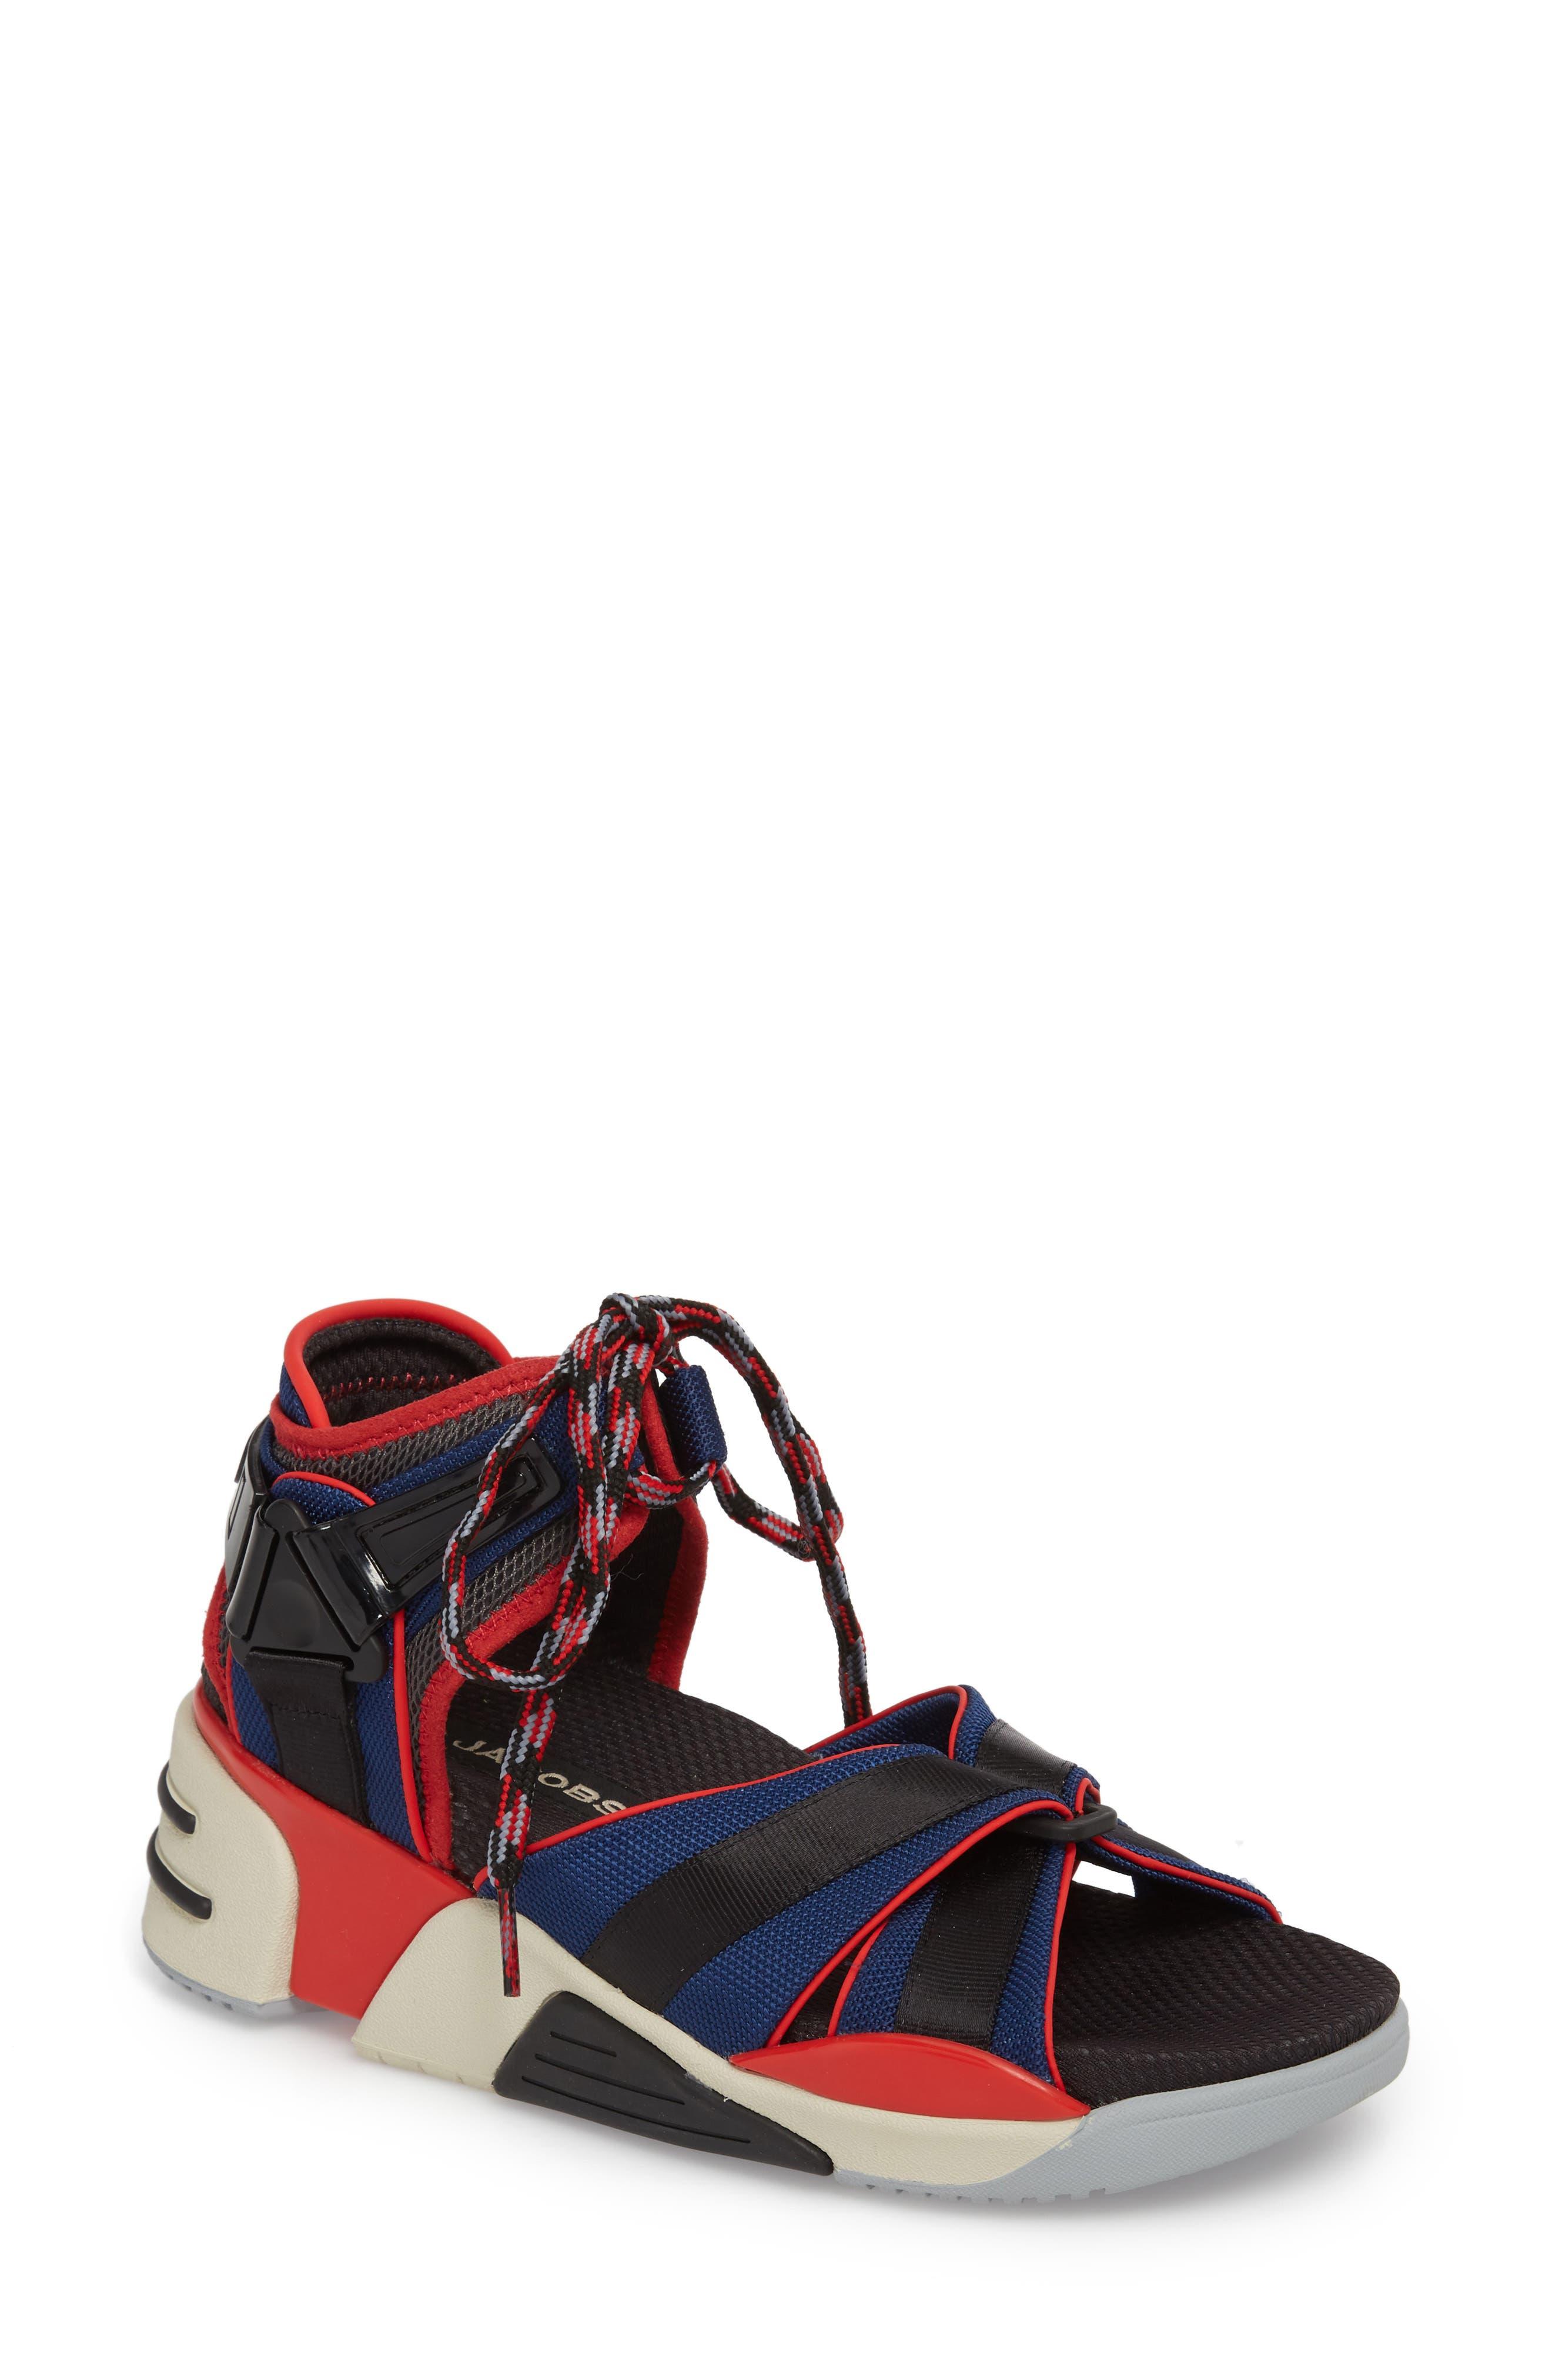 Somewhere Sport Sandal,                             Main thumbnail 1, color,                             Red Multi